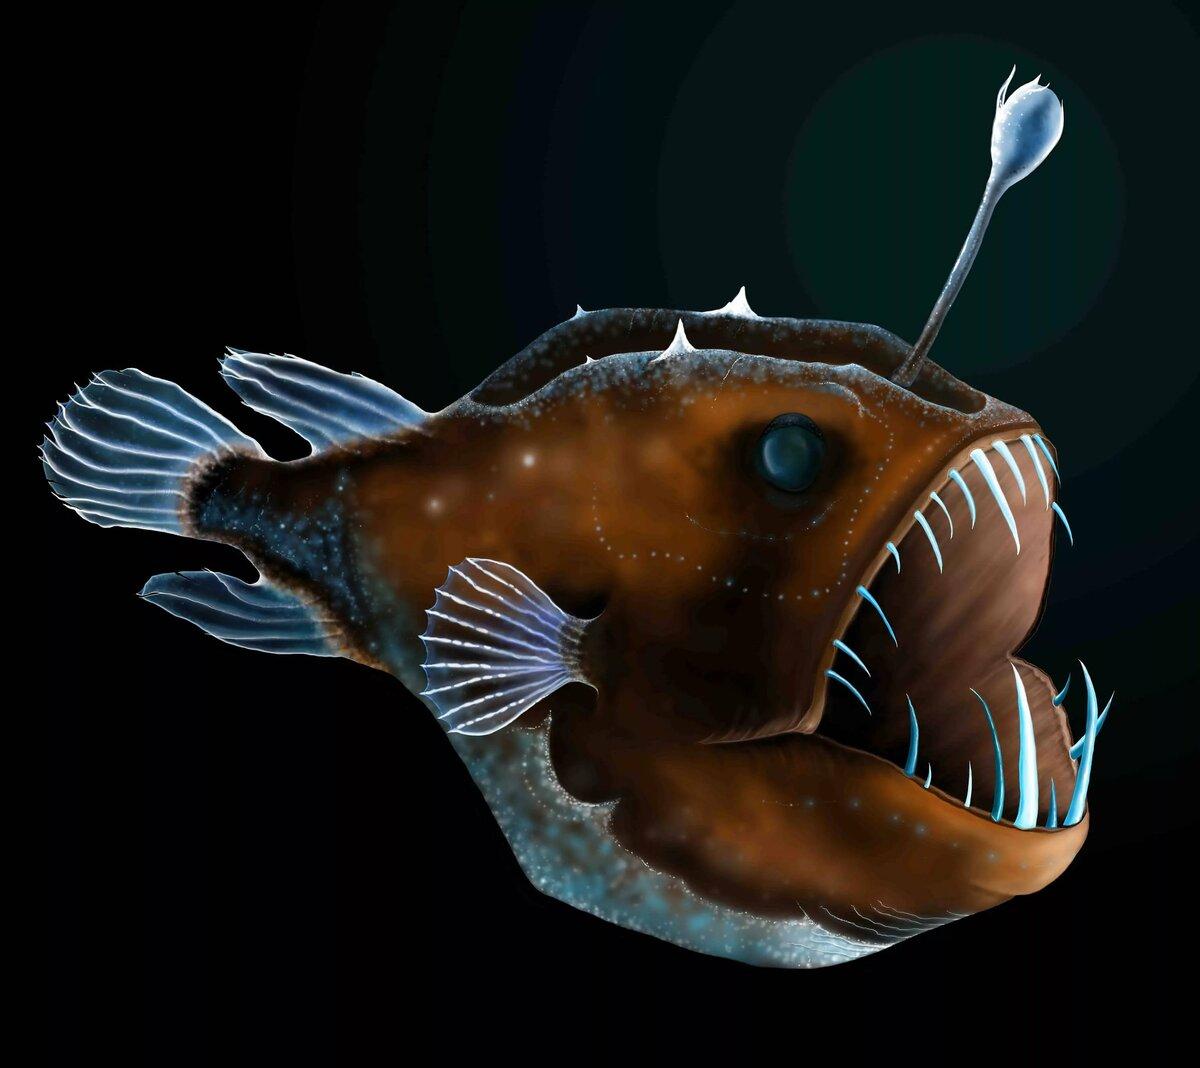 картинки рыба свет таким большим